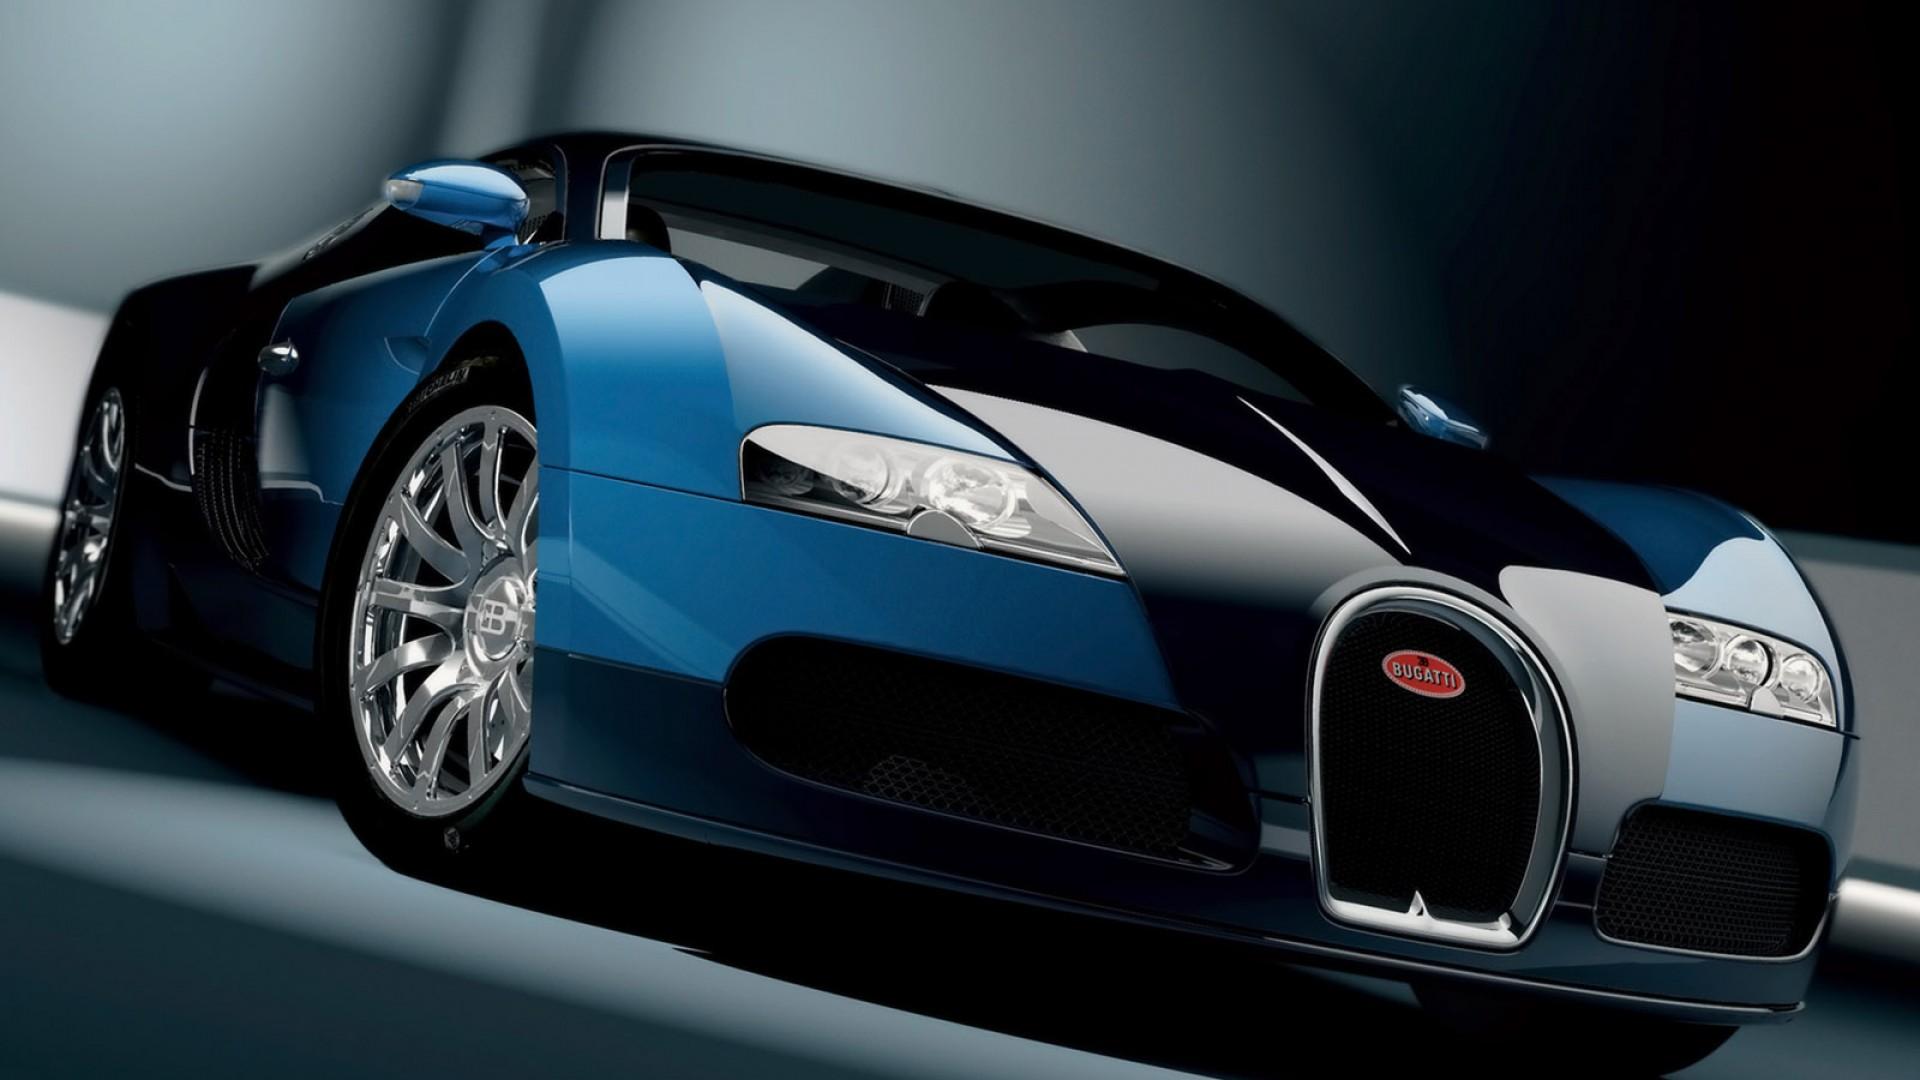 Bugatti-black-hd-background-Black-And-Blue-Hd-Black-And-Blue-Hd-wallpaper-wp3603740